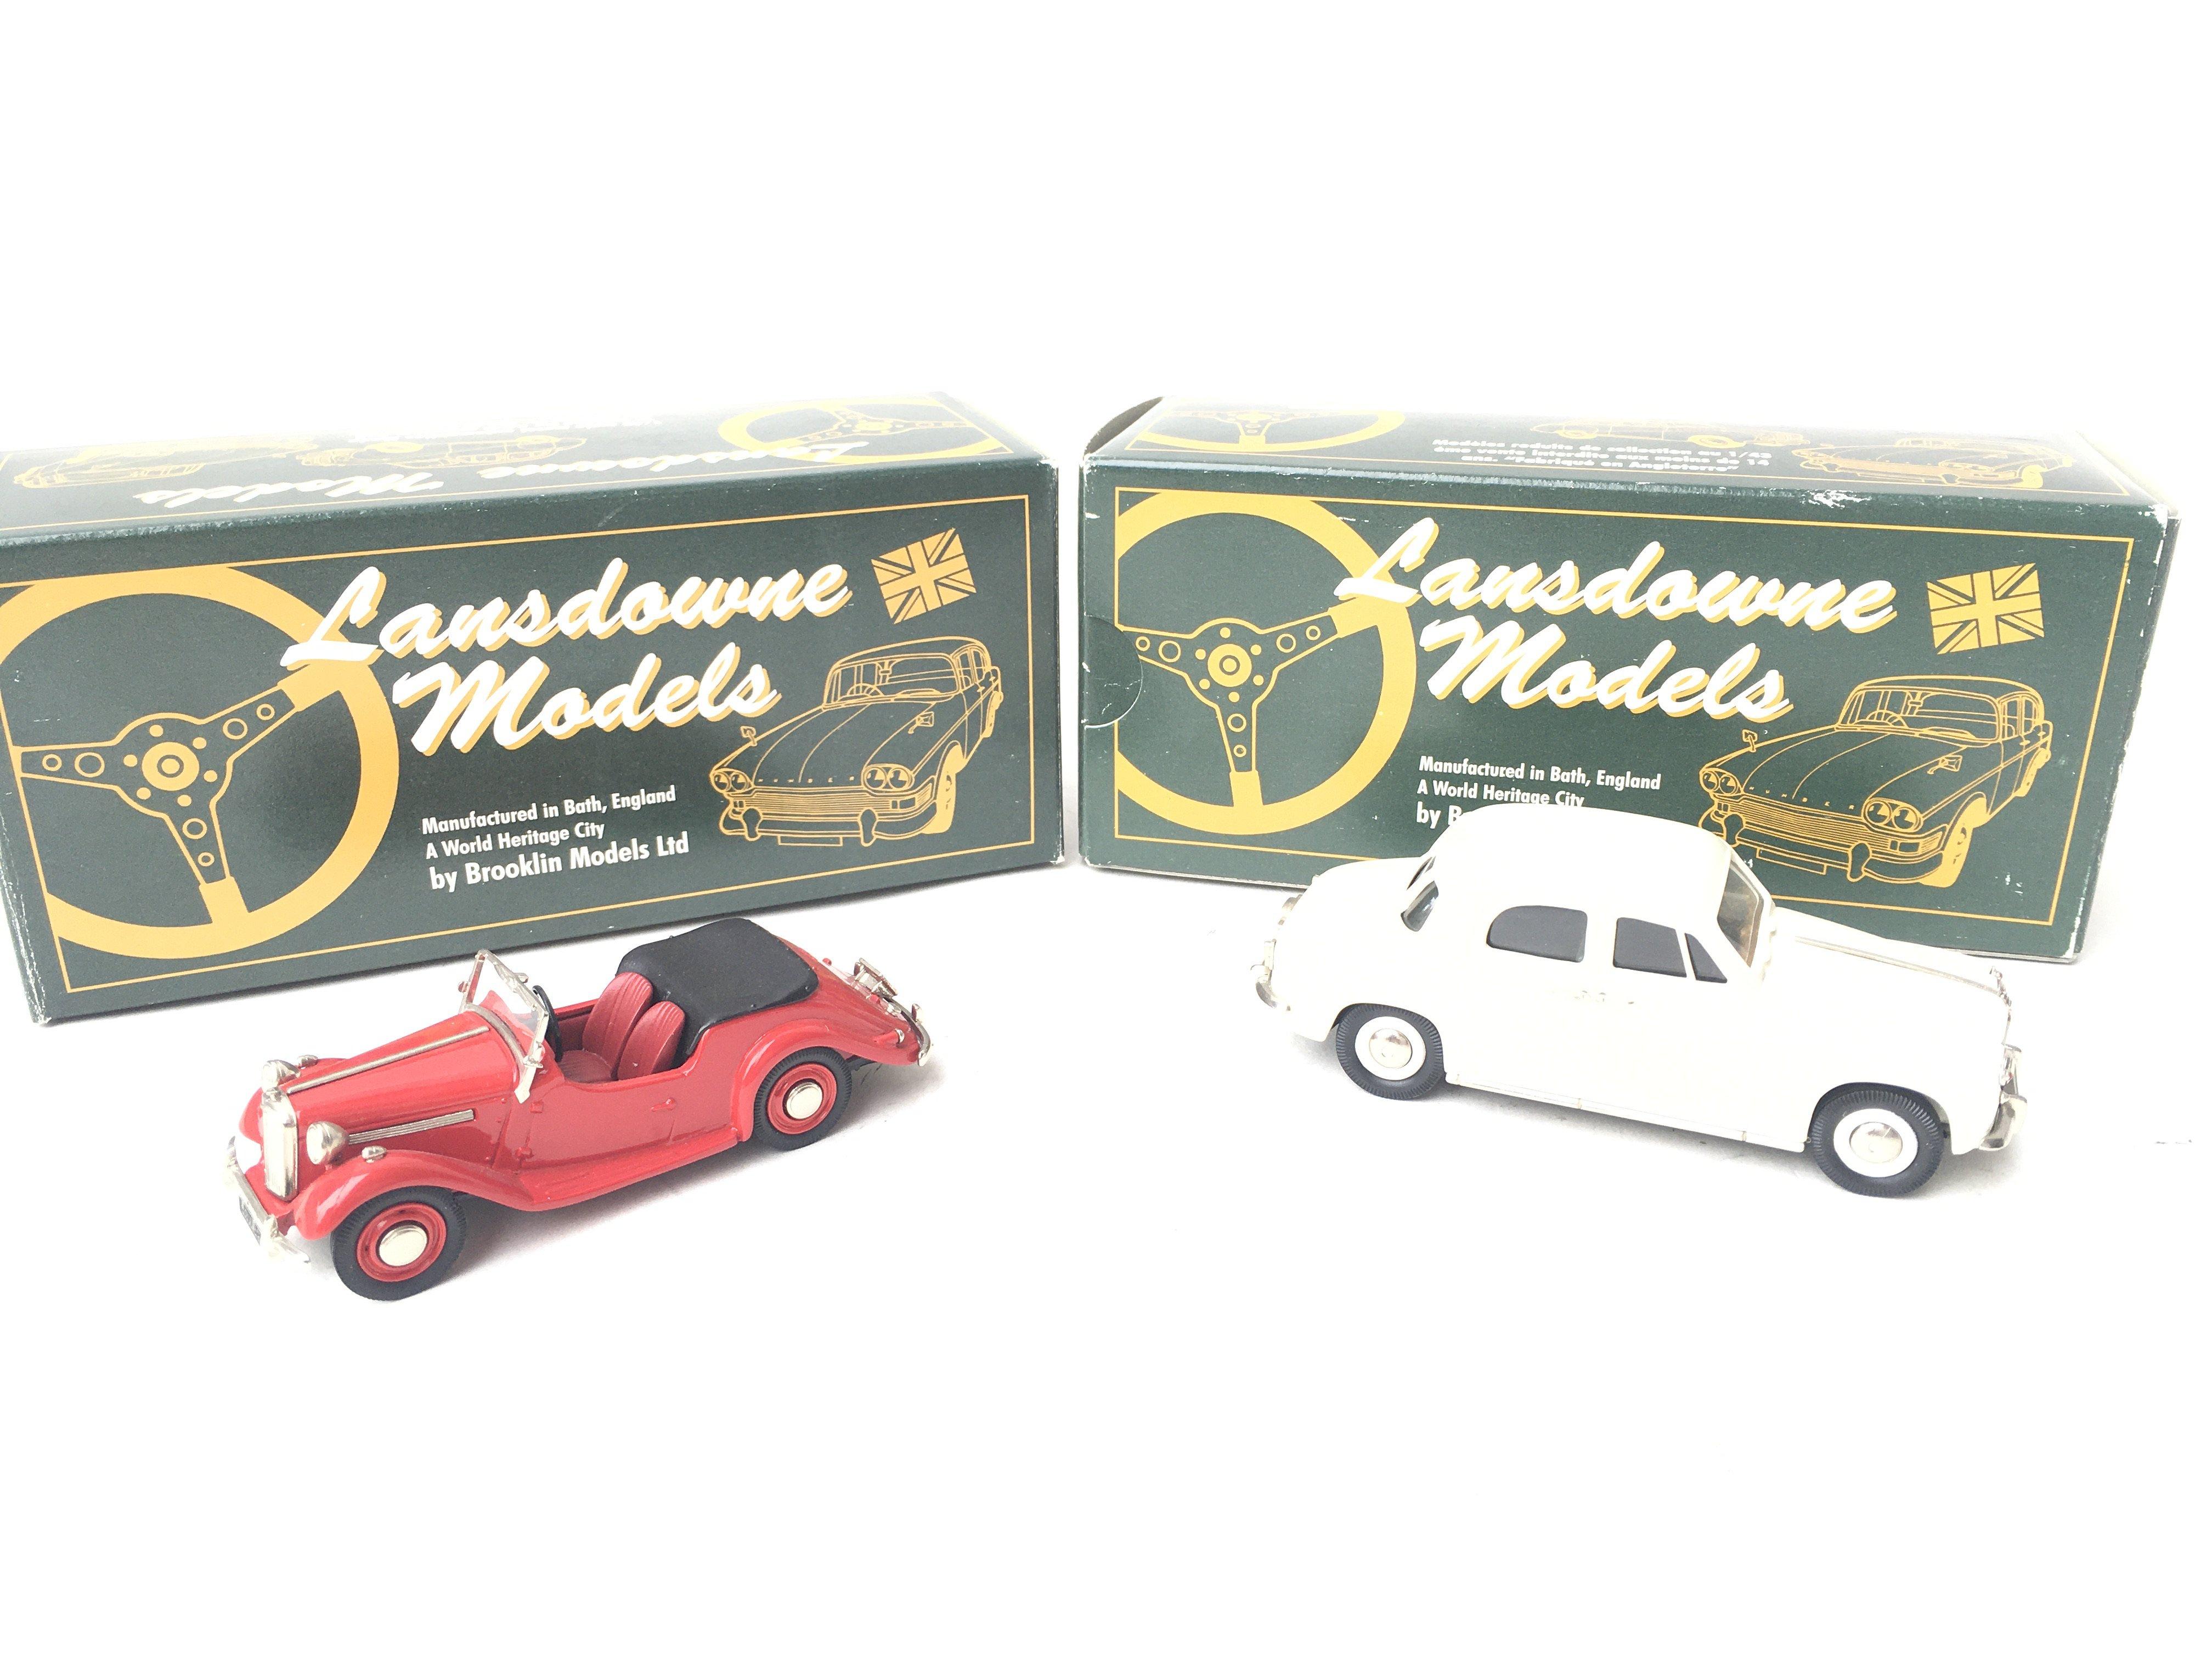 2 X Lansdowne Models. LDM 25 1954 Singer SM Roadst